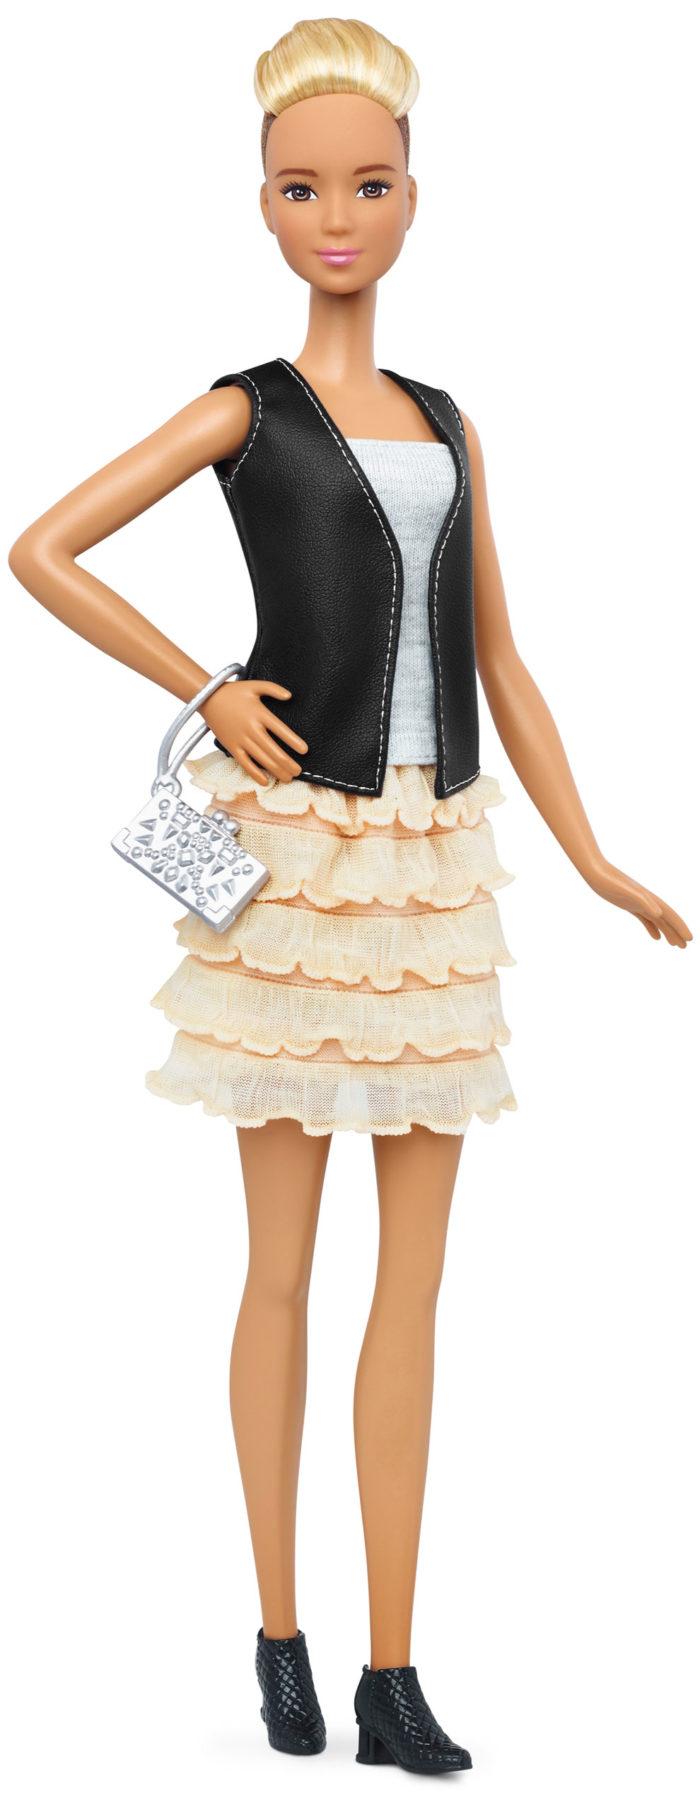 barbie-nuove-curvy-bassa-alta-realistica-12